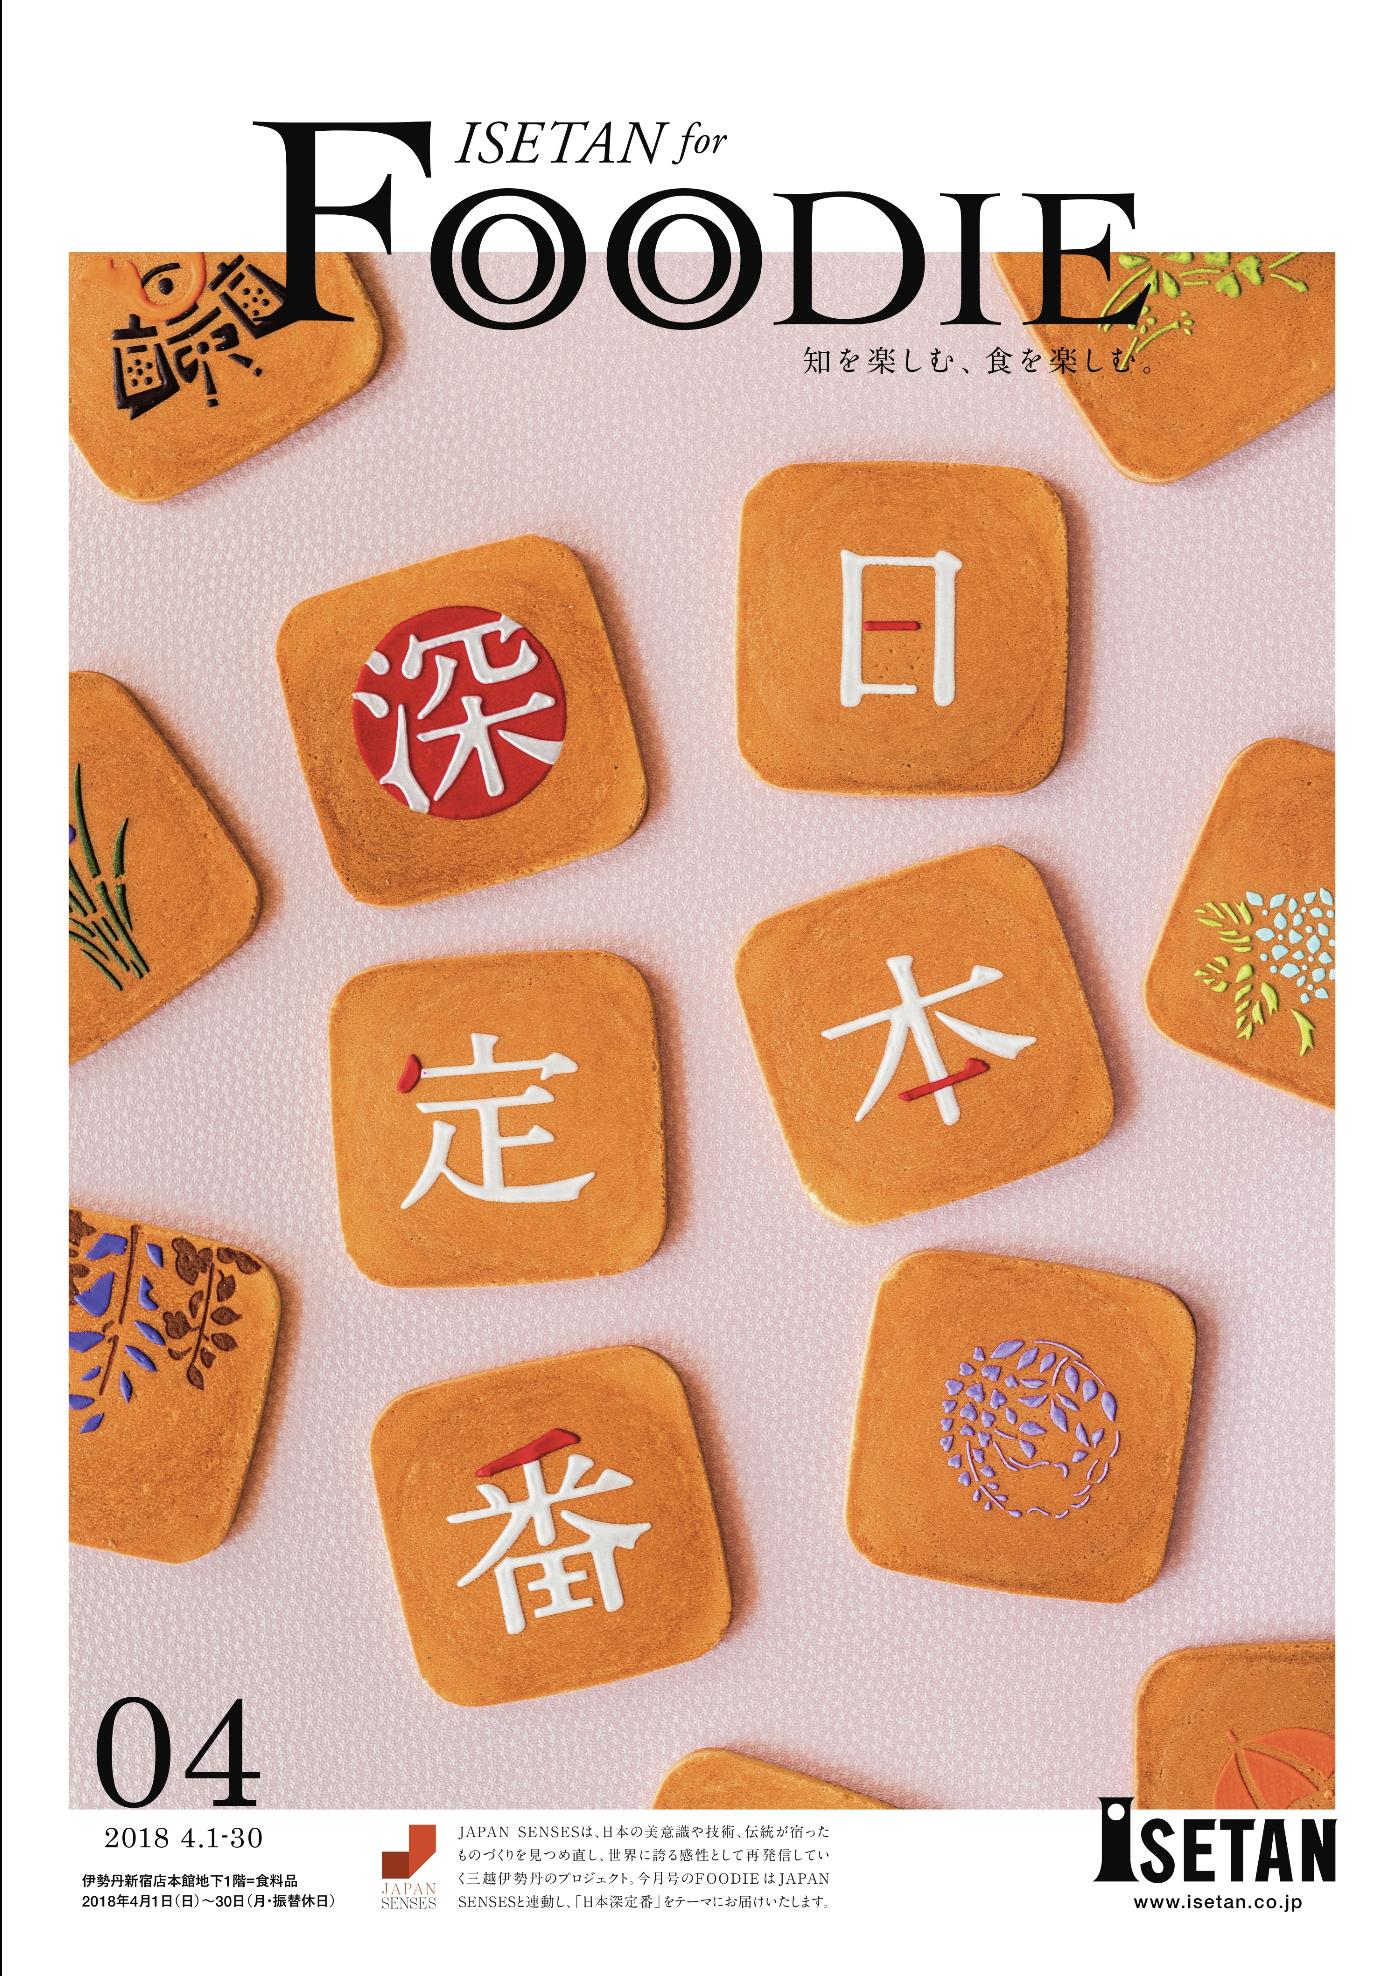 ISETAN for FOODIE4月号表紙、中ページと丸っと一冊撮影させいただいております。